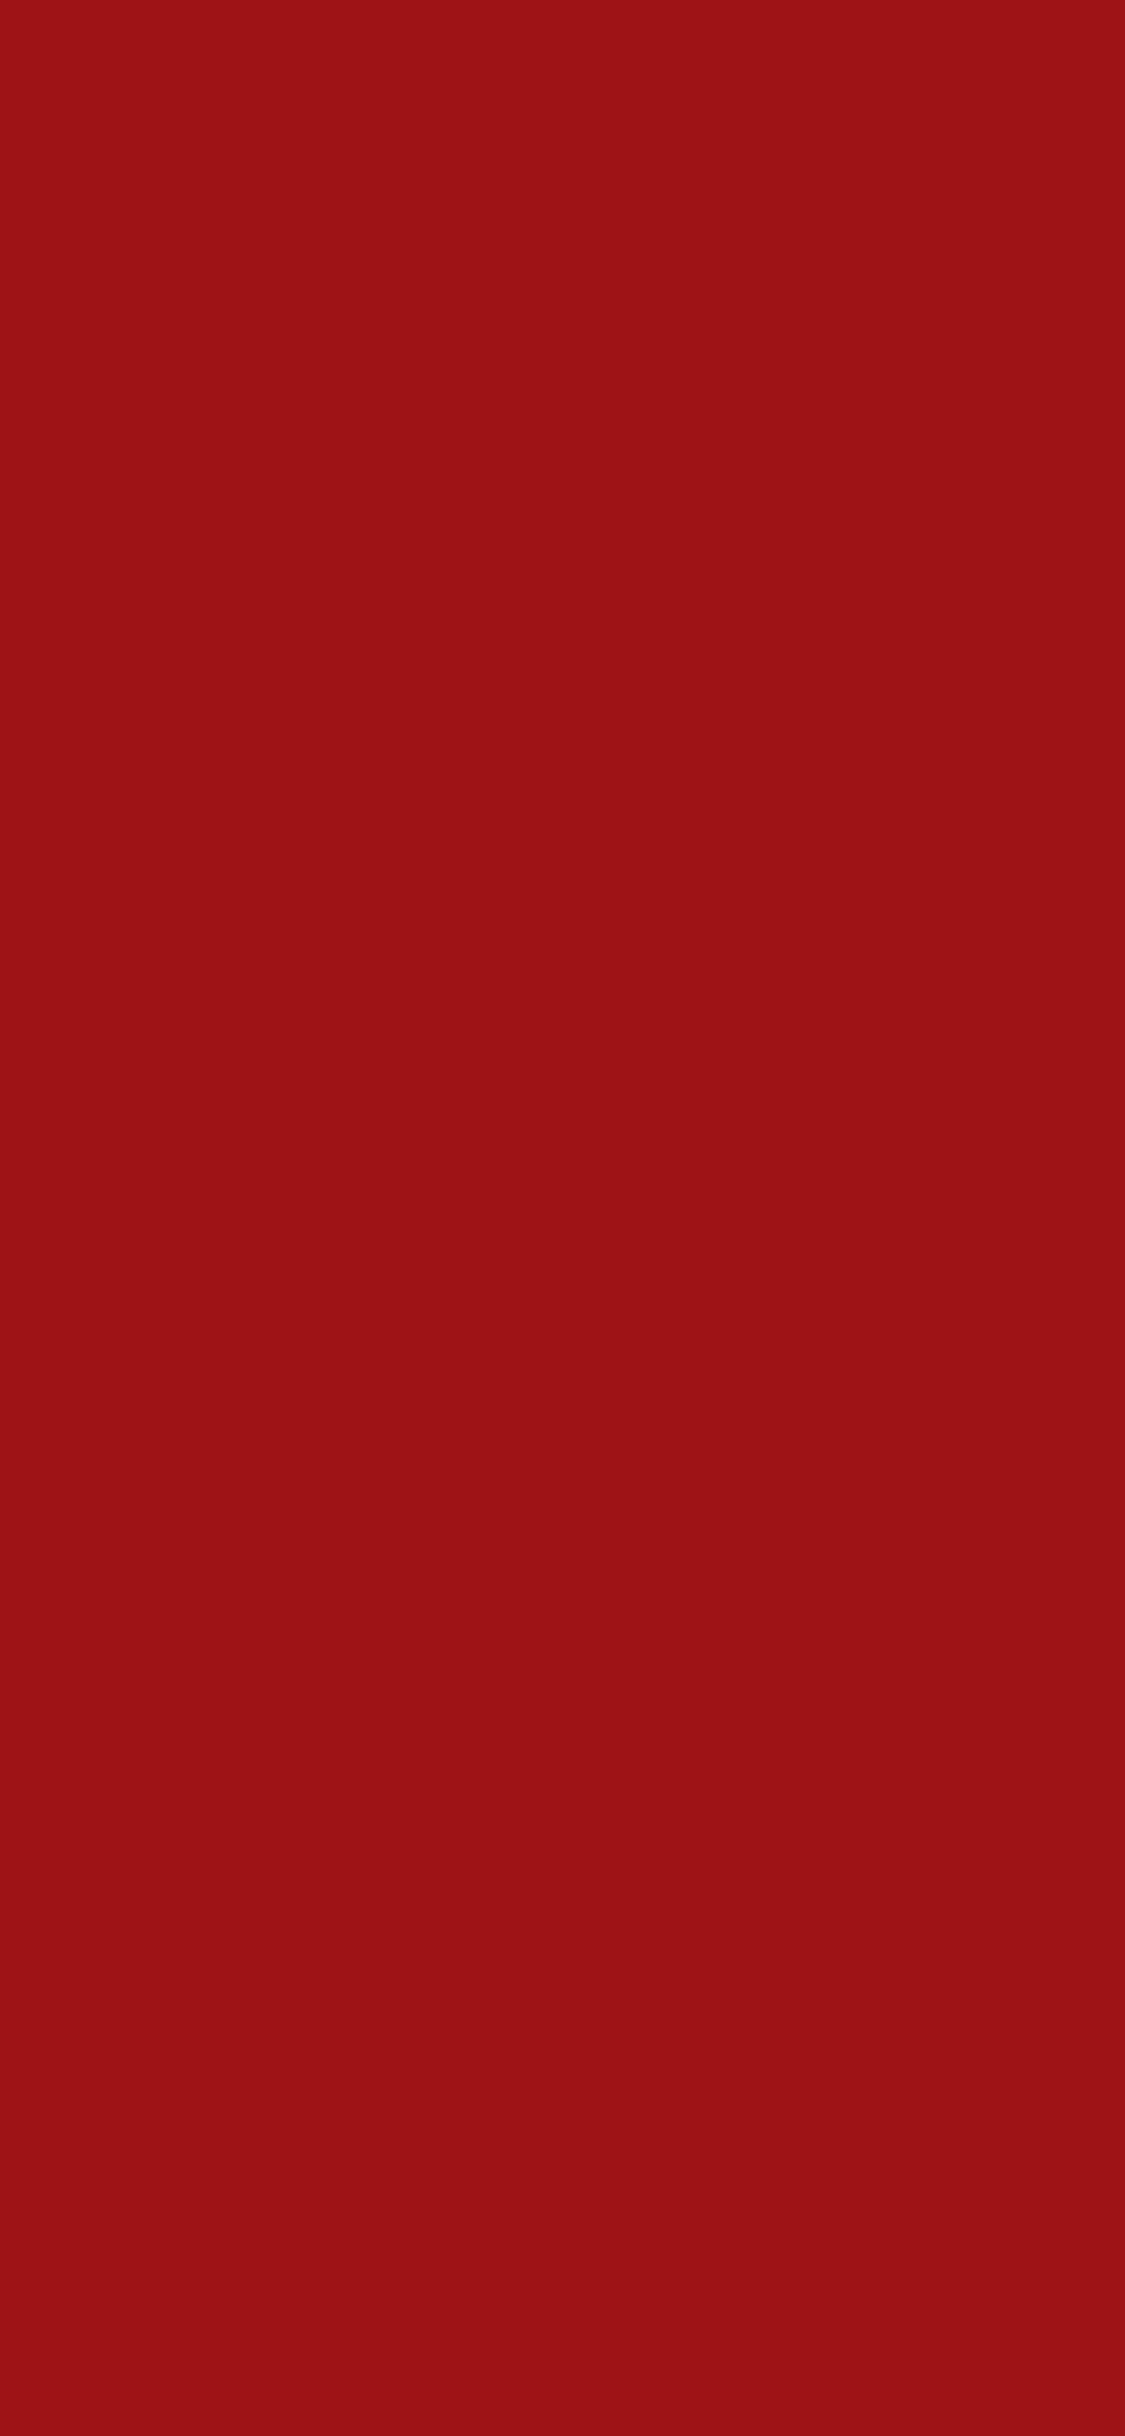 1125x2436 Spartan Crimson Solid Color Background